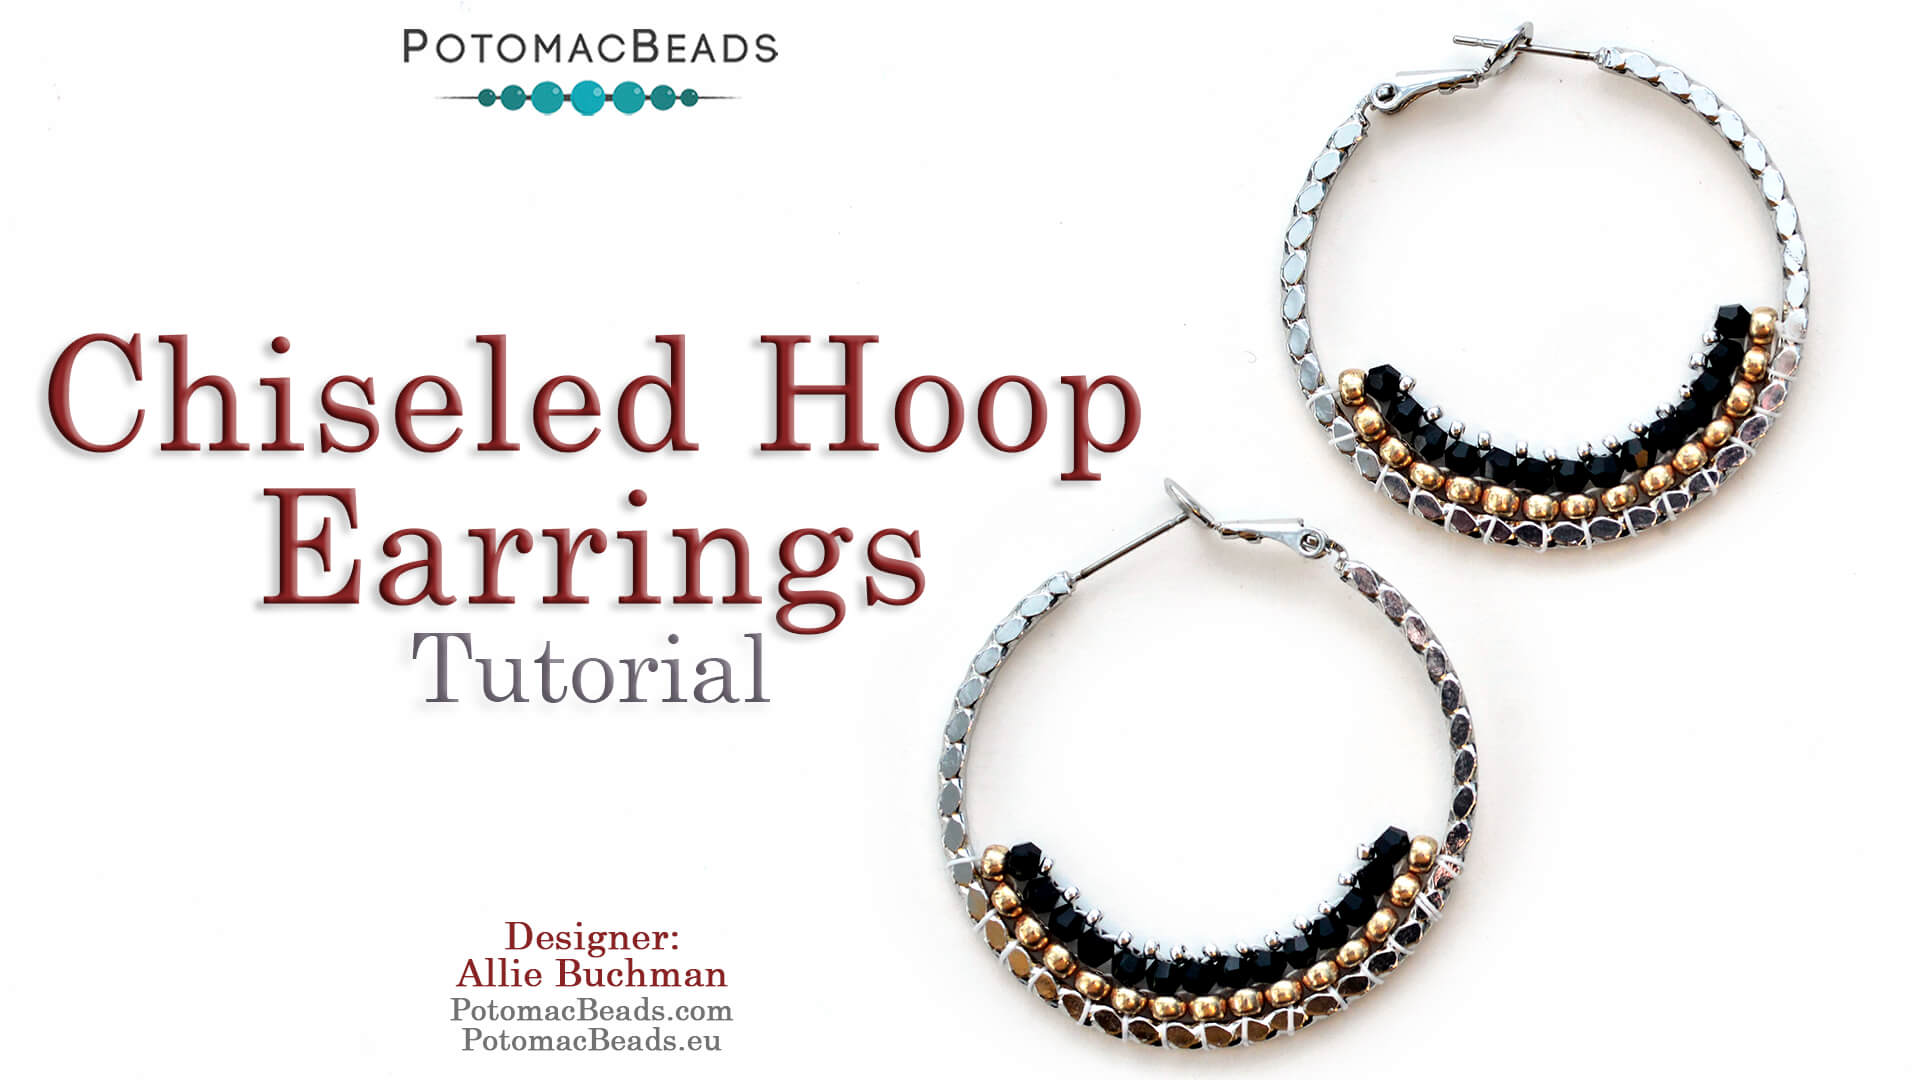 How to Bead Jewelry / Videos Sorted by Beads / Potomac Crystal Videos / Chiseled Hoop Earrings Tutorial